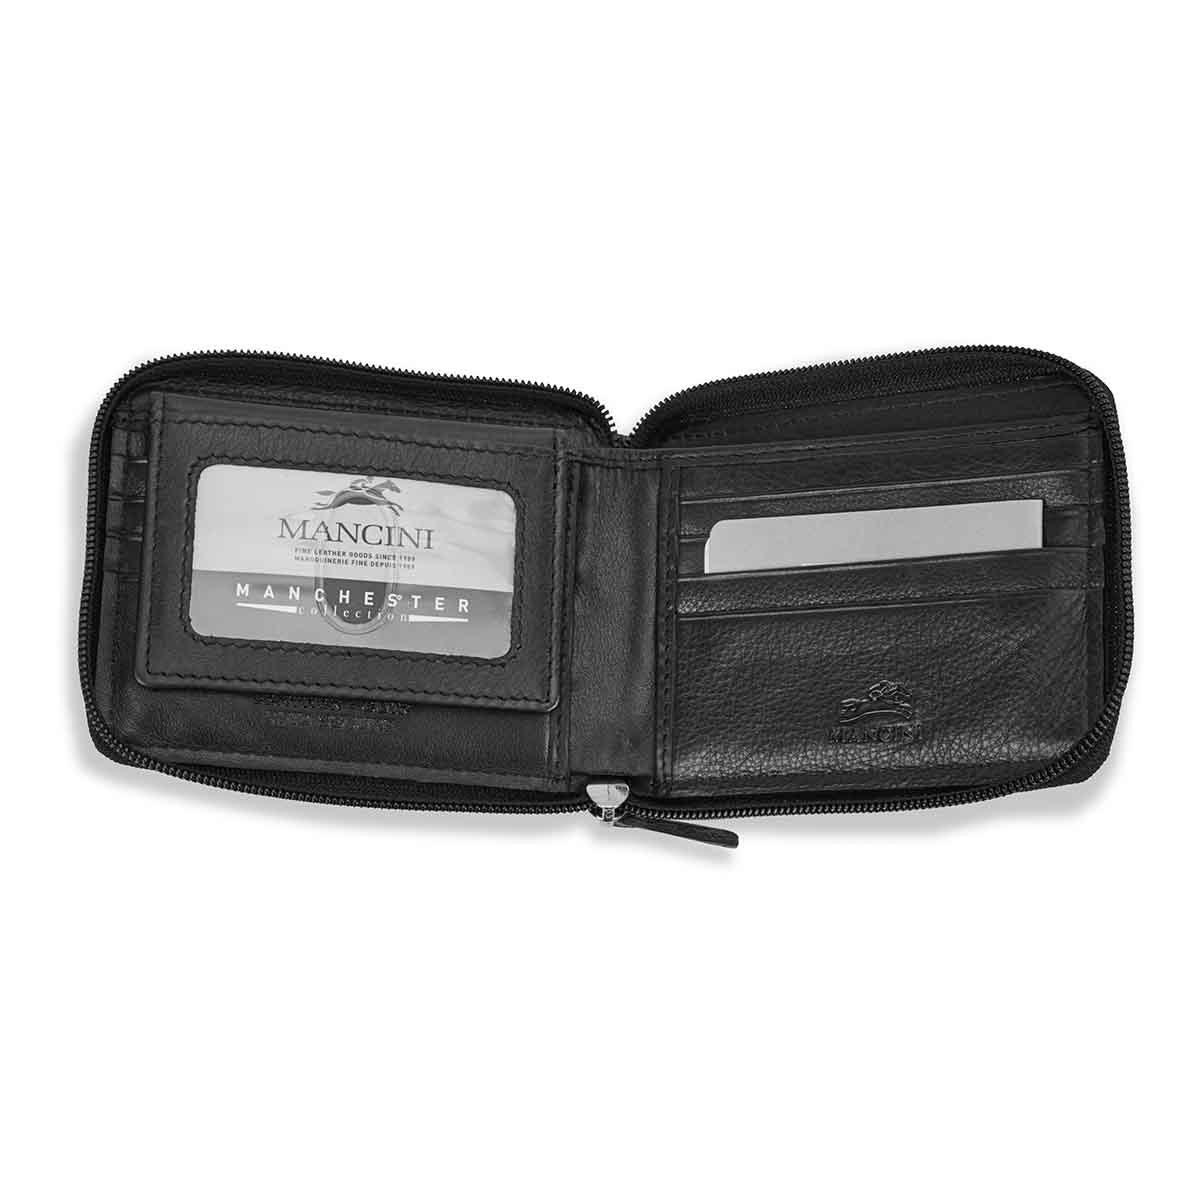 Mns zip around RFID secure wallet